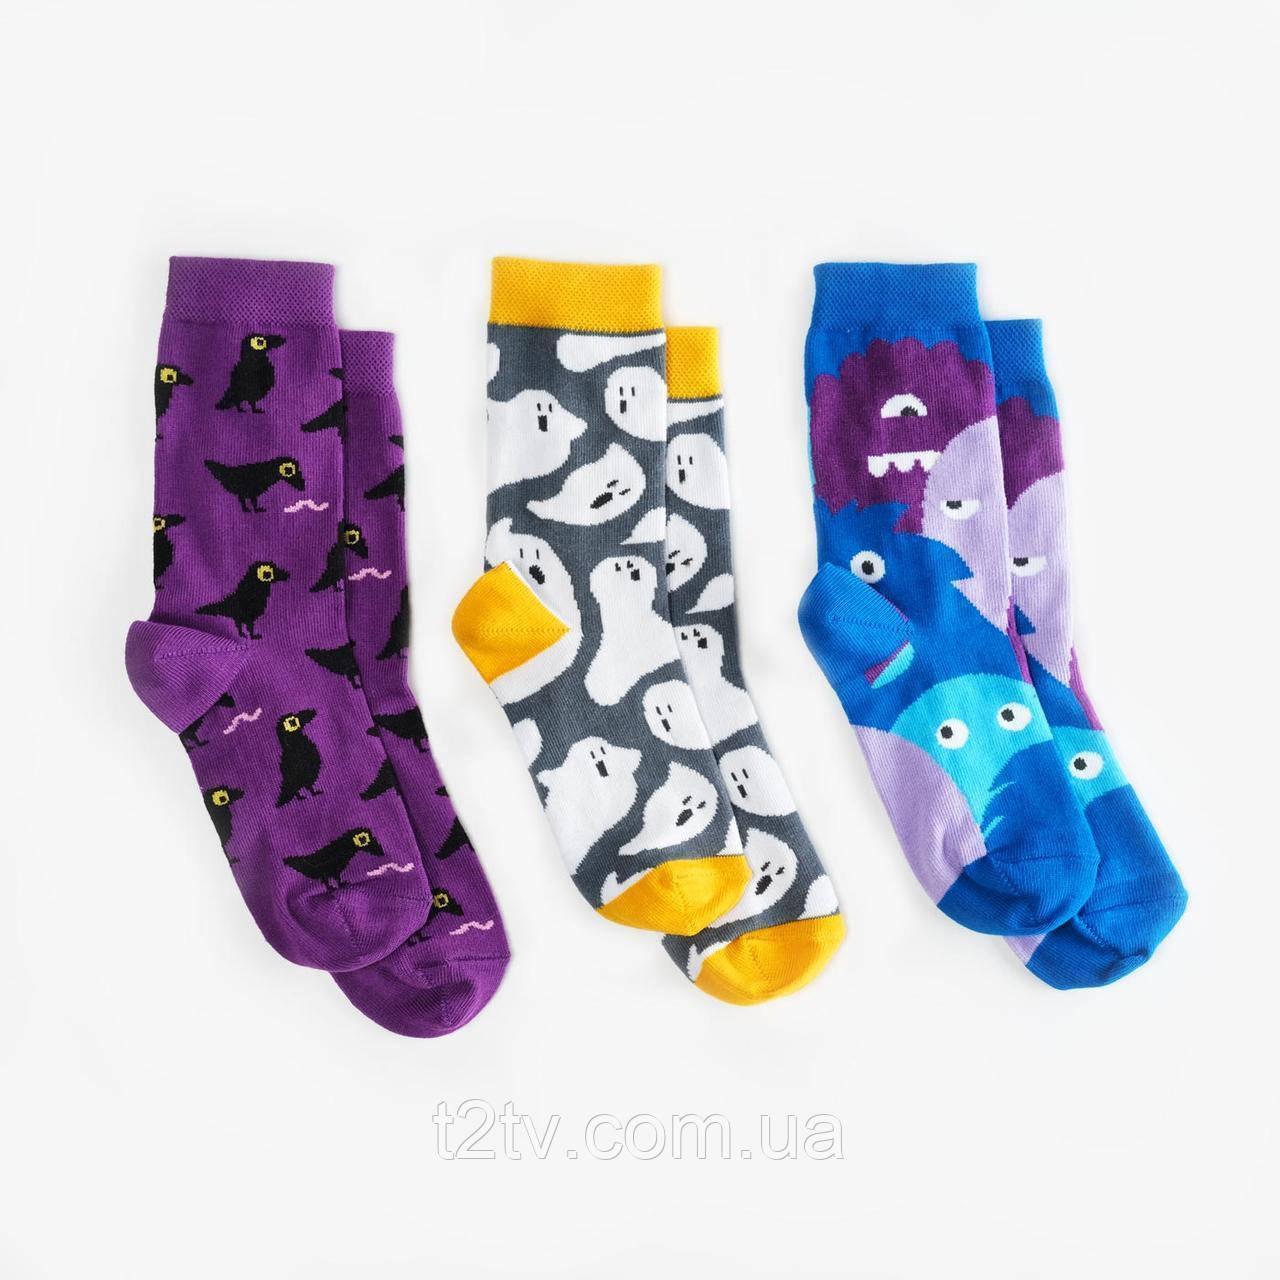 Носки детские Dodo Socks набор Babaiko 2-3 года